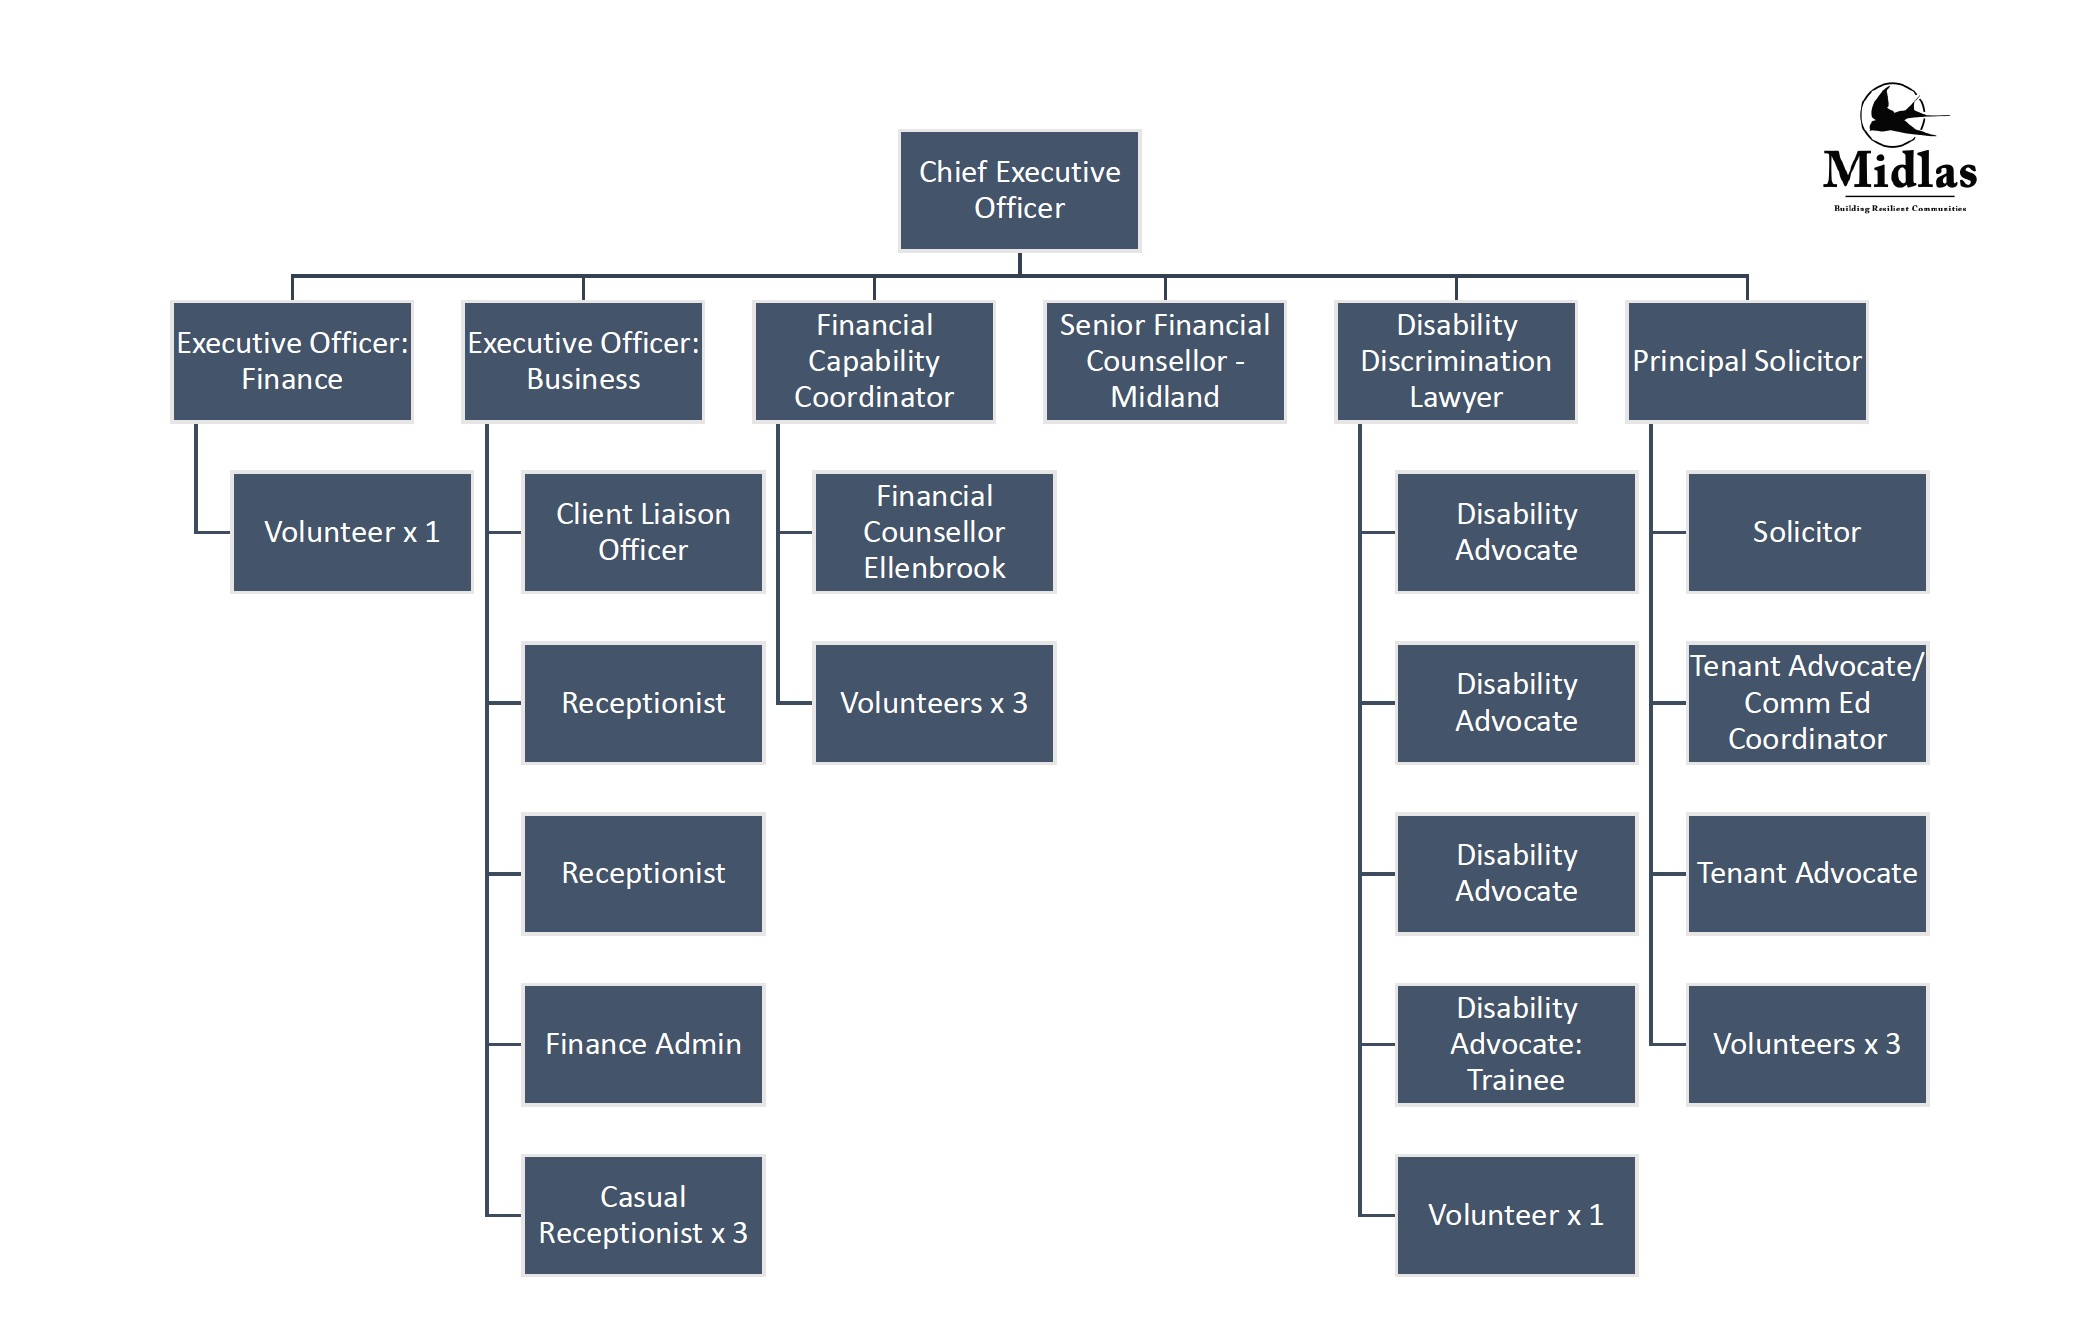 2019 Org Chart Image.jpg